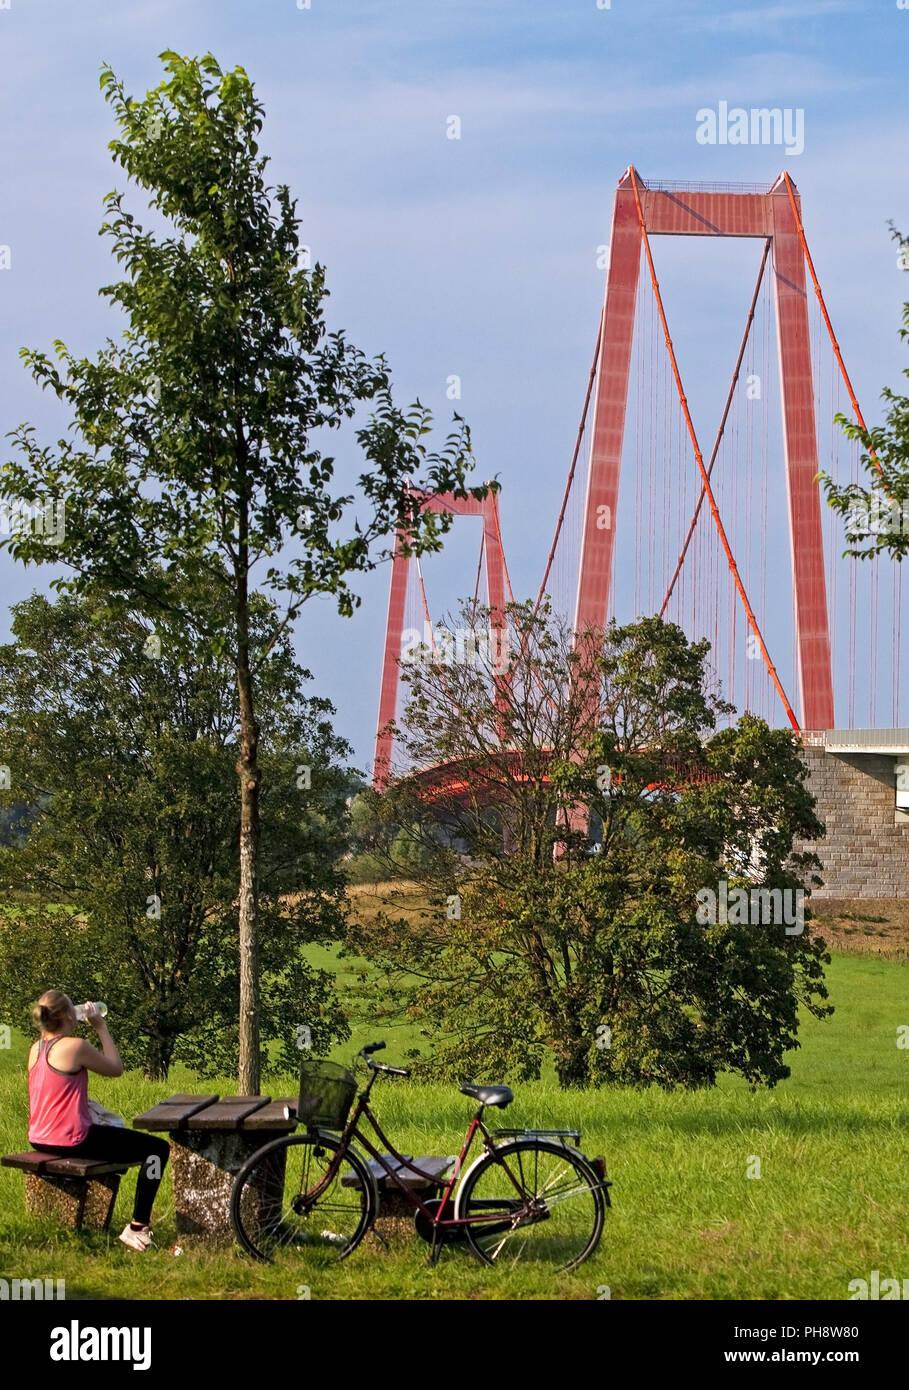 Avoir une pause cycliste, Rhein bridge, Emmerich Photo Stock